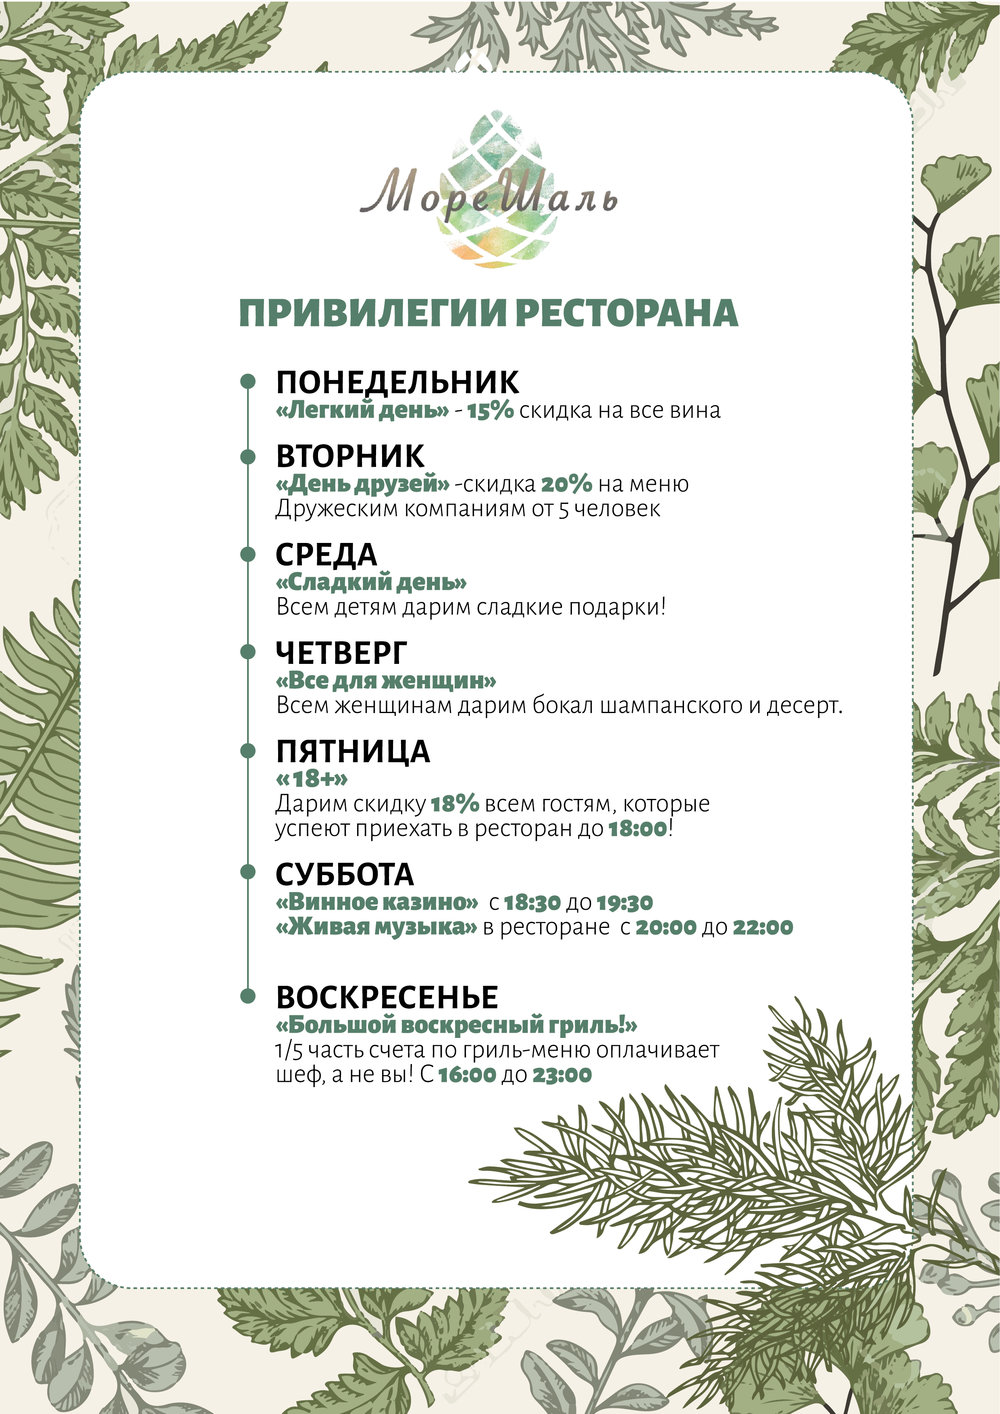 привилегии_ресторана_ДУМ-01.jpg